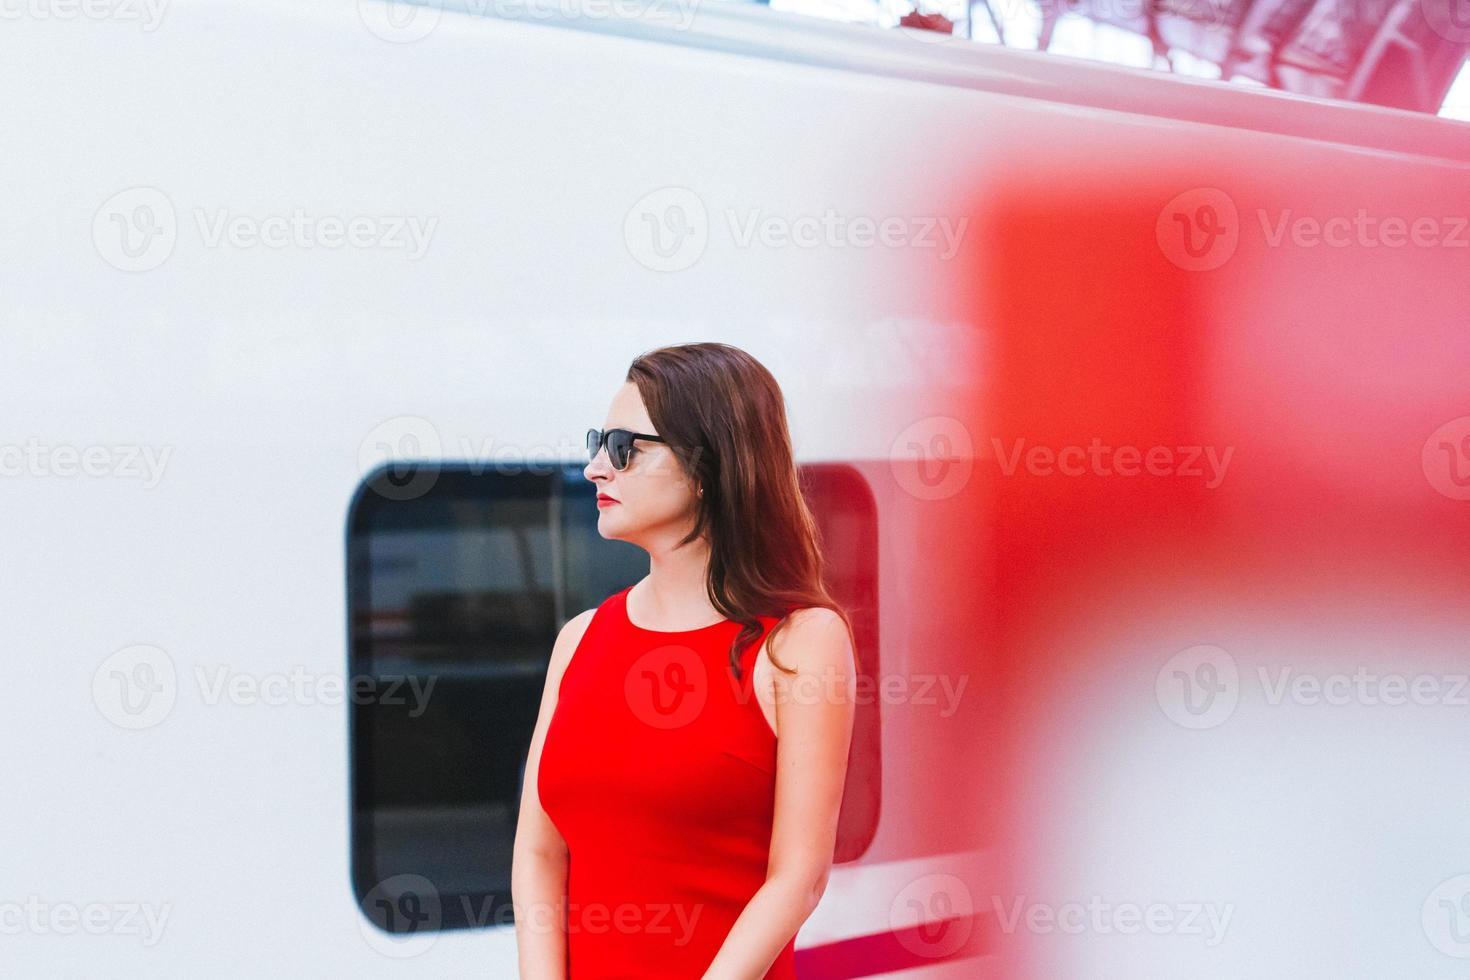 Frauenporträt foto